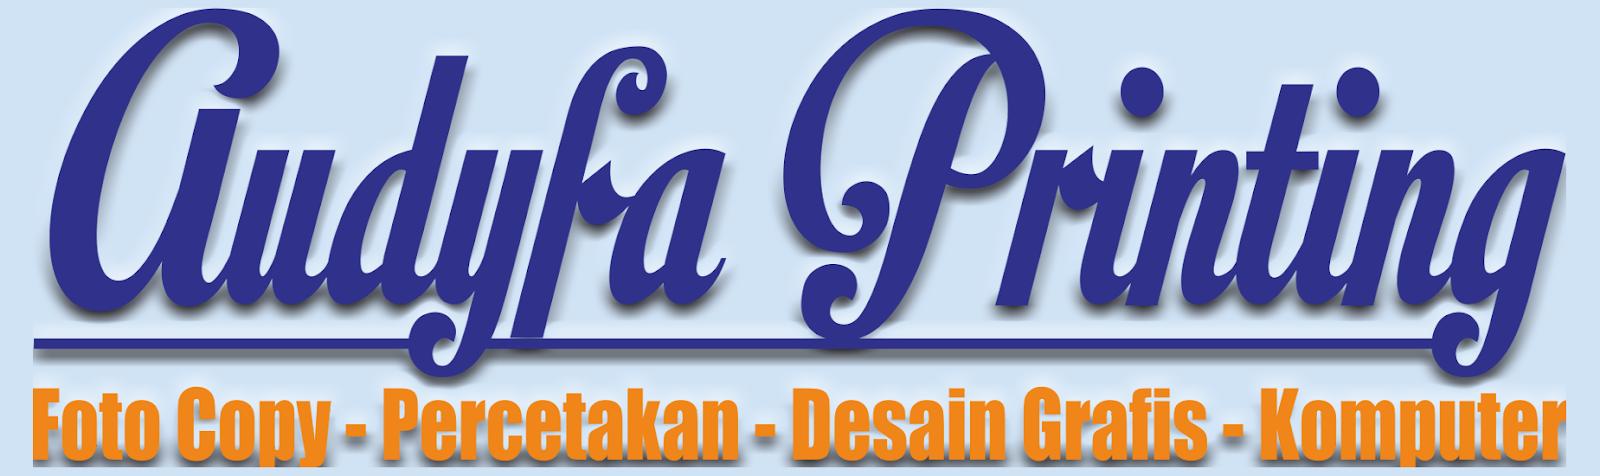 Audyfa Printing   Brosur, Branding, Spanduk, Sticker, Desain Grafis